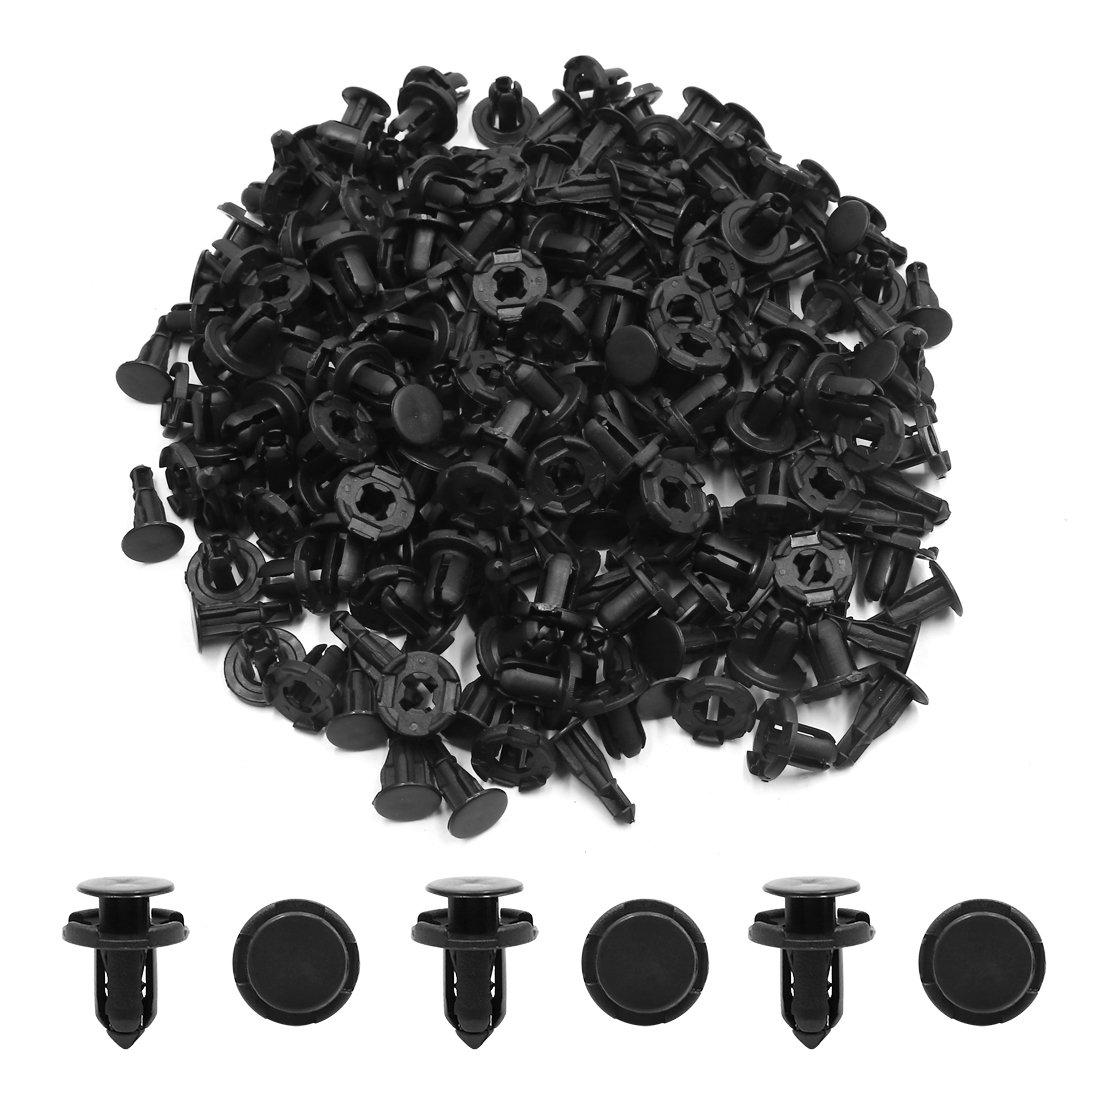 uxcell 100pcs Black Plastic 9mm Car Push Clips Panel Rivets Fender Bumper Fastener